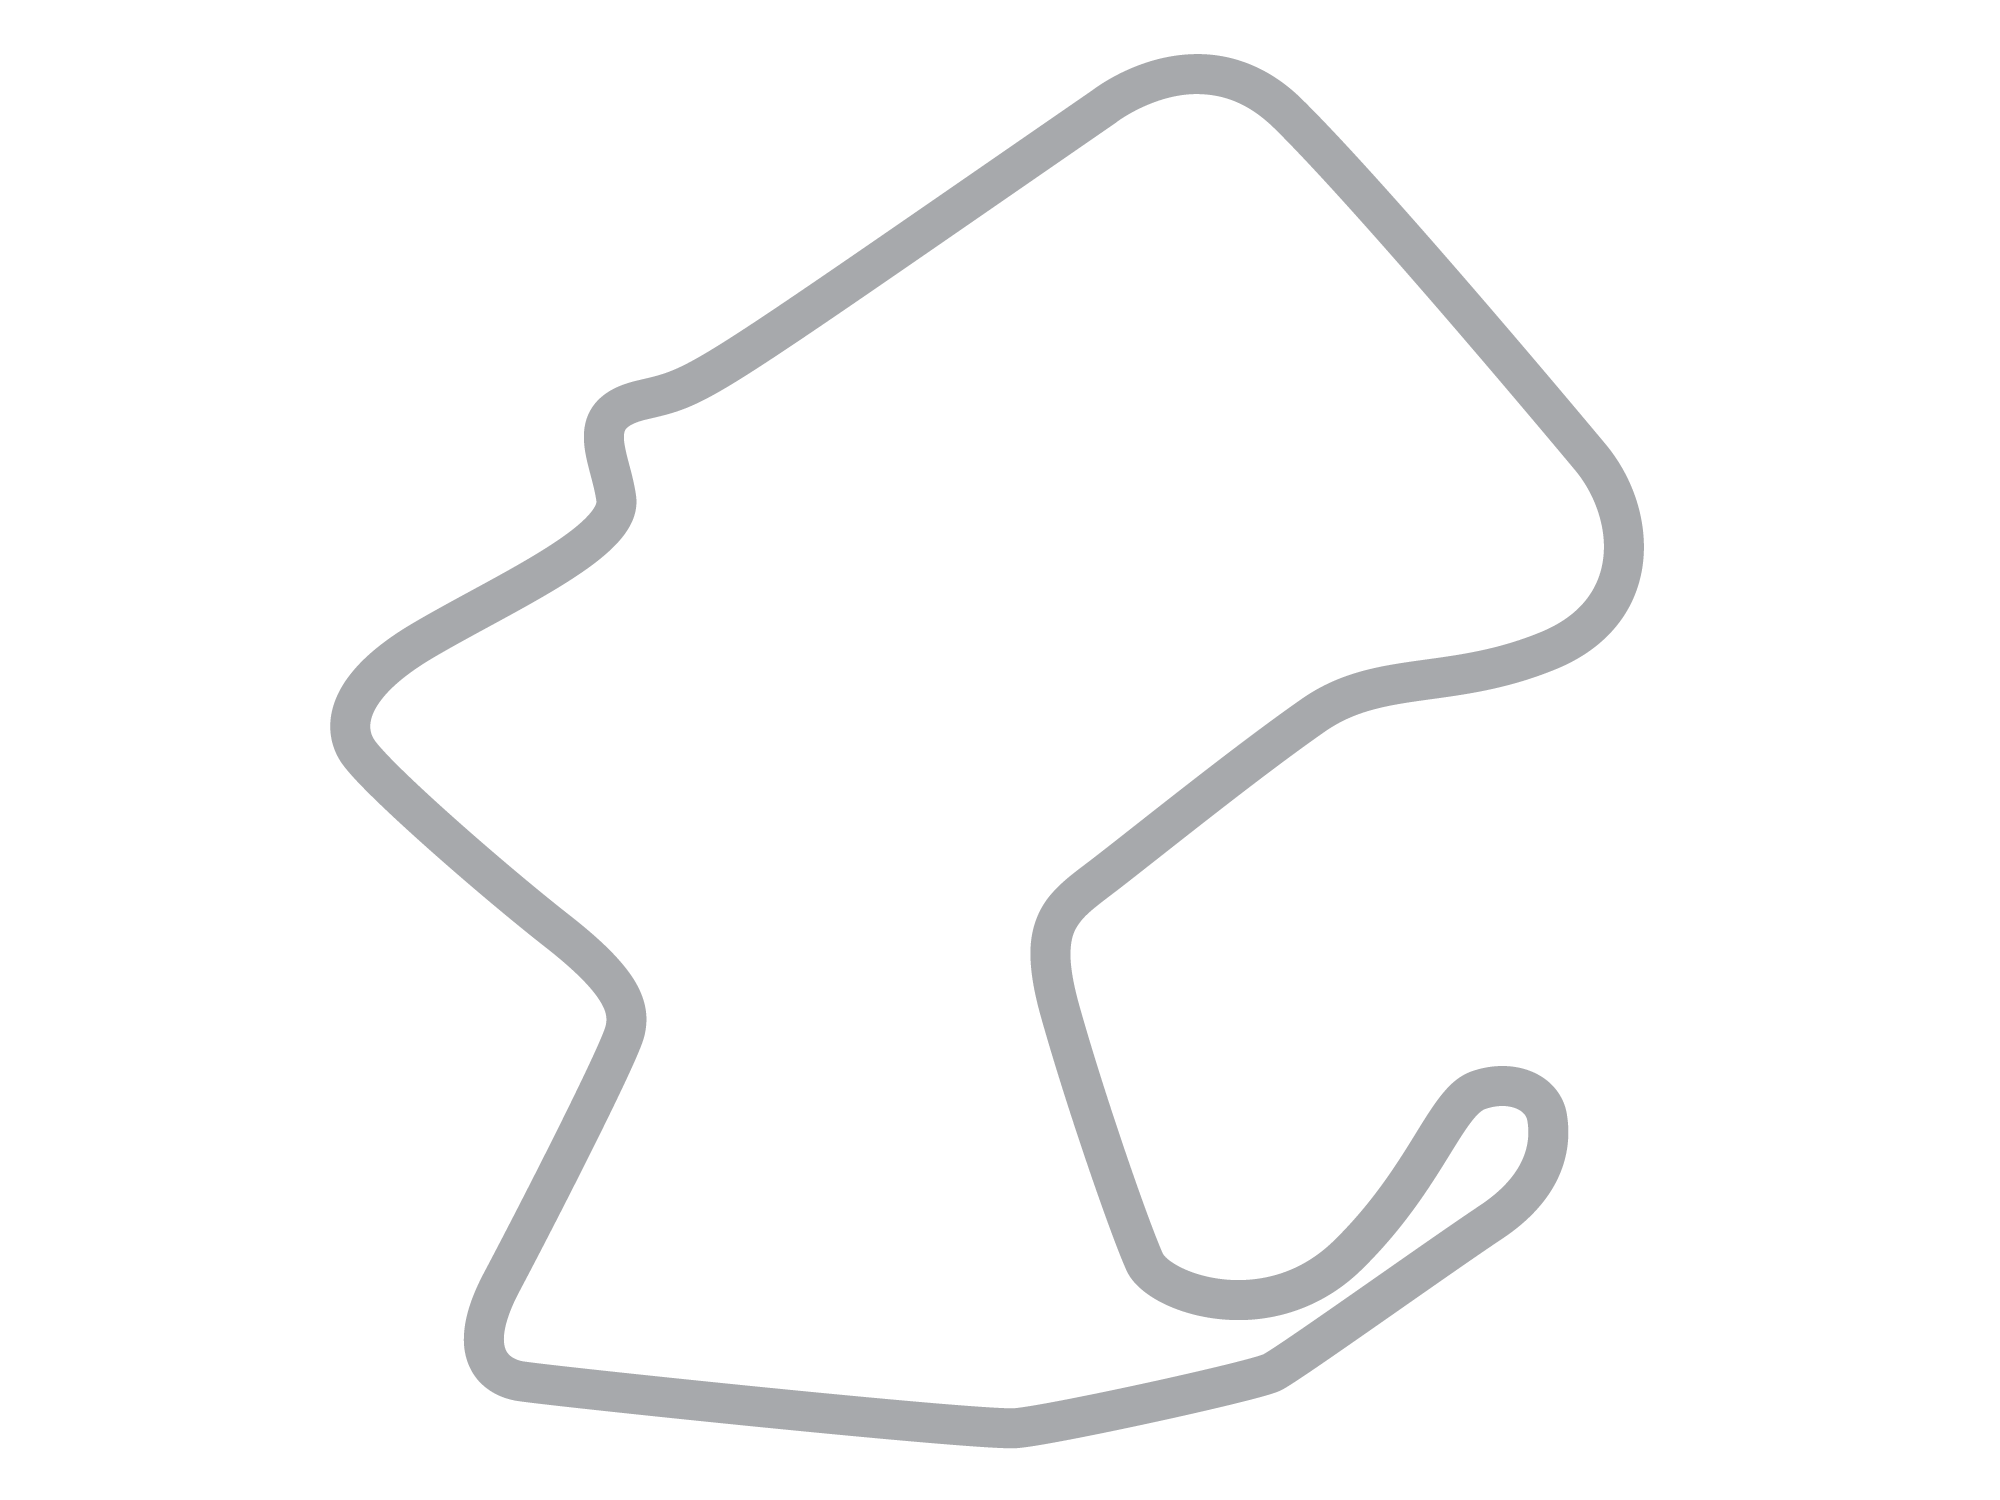 2018 WorldSBK Calendar - Yamaha Racing